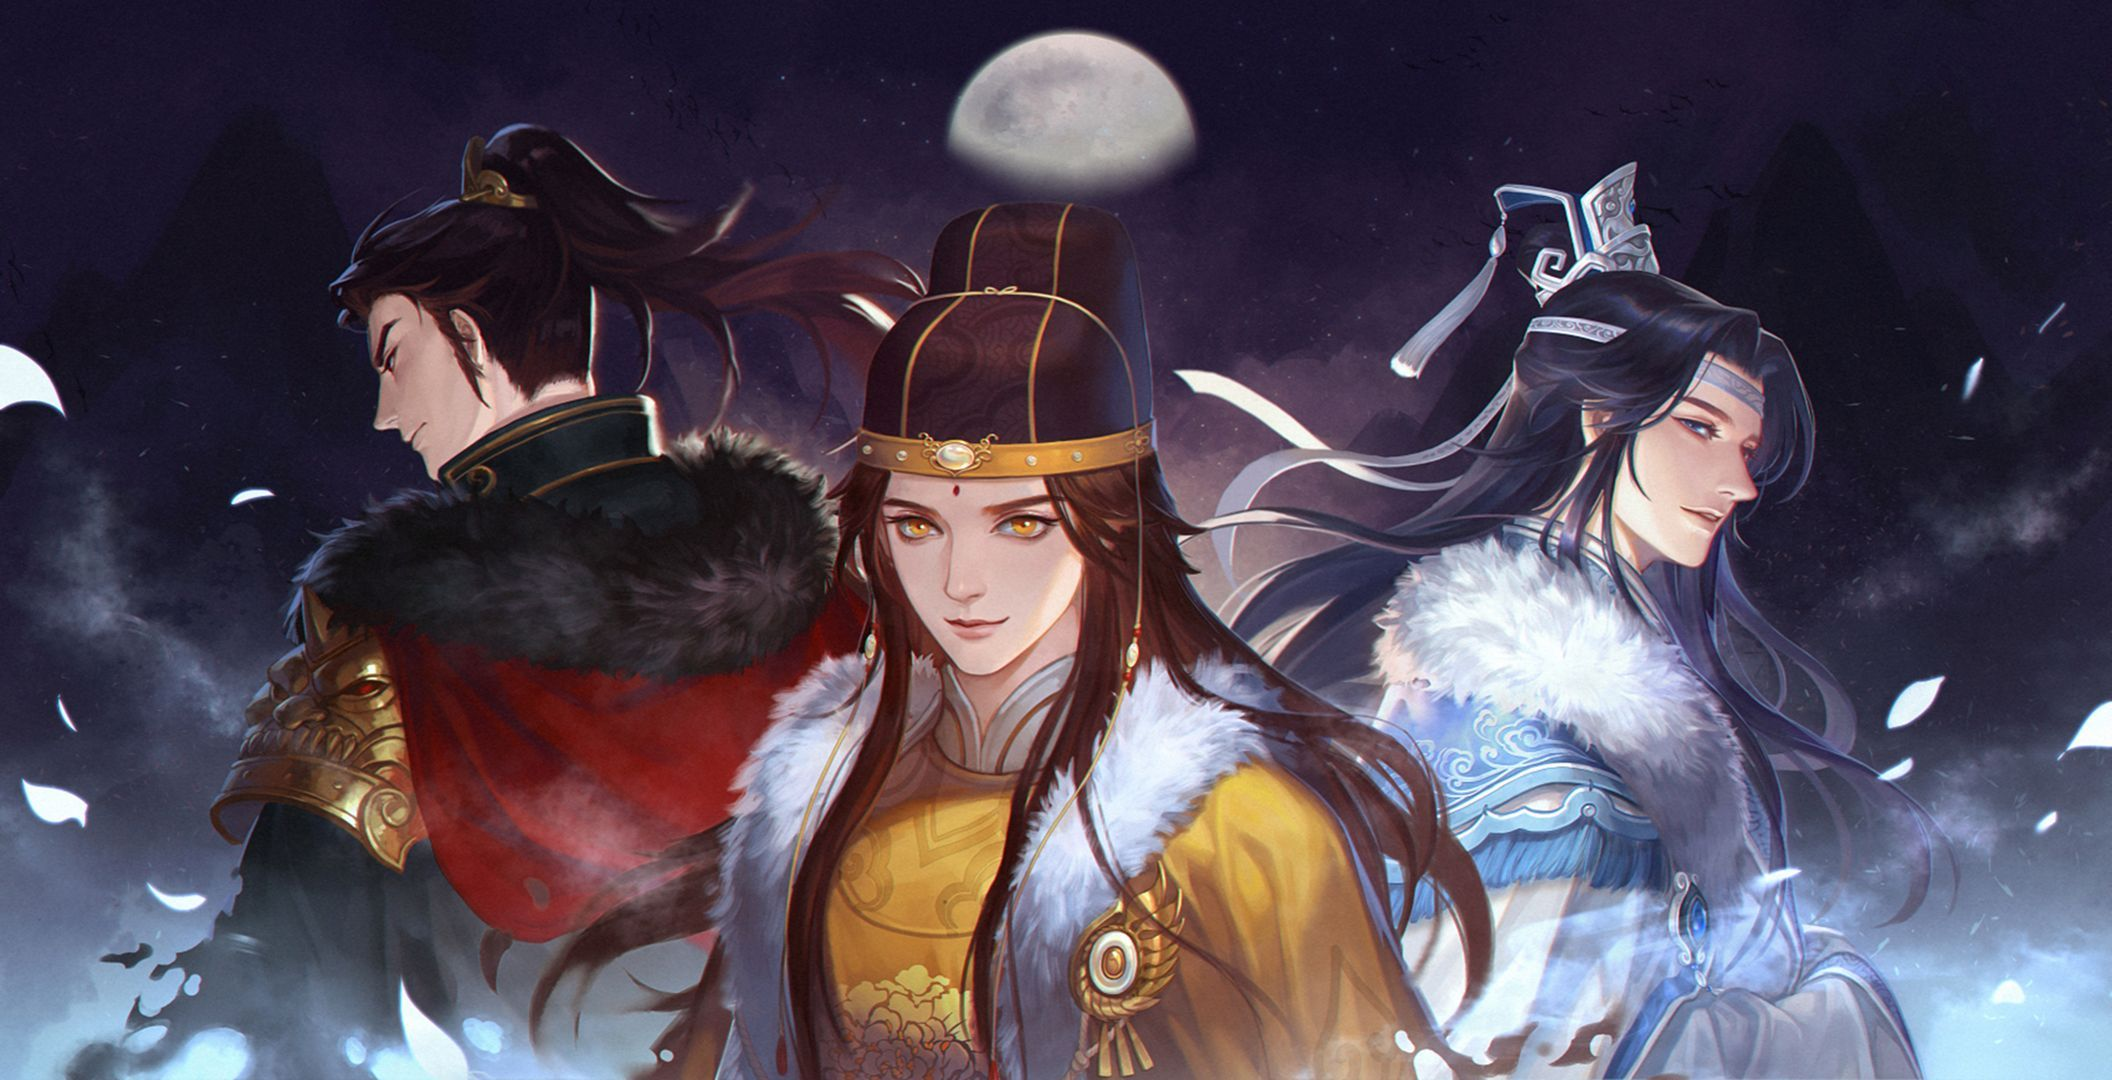 Mo Dao Zu Shi Desktop 1080p Wallpapers - Wallpaper Cave